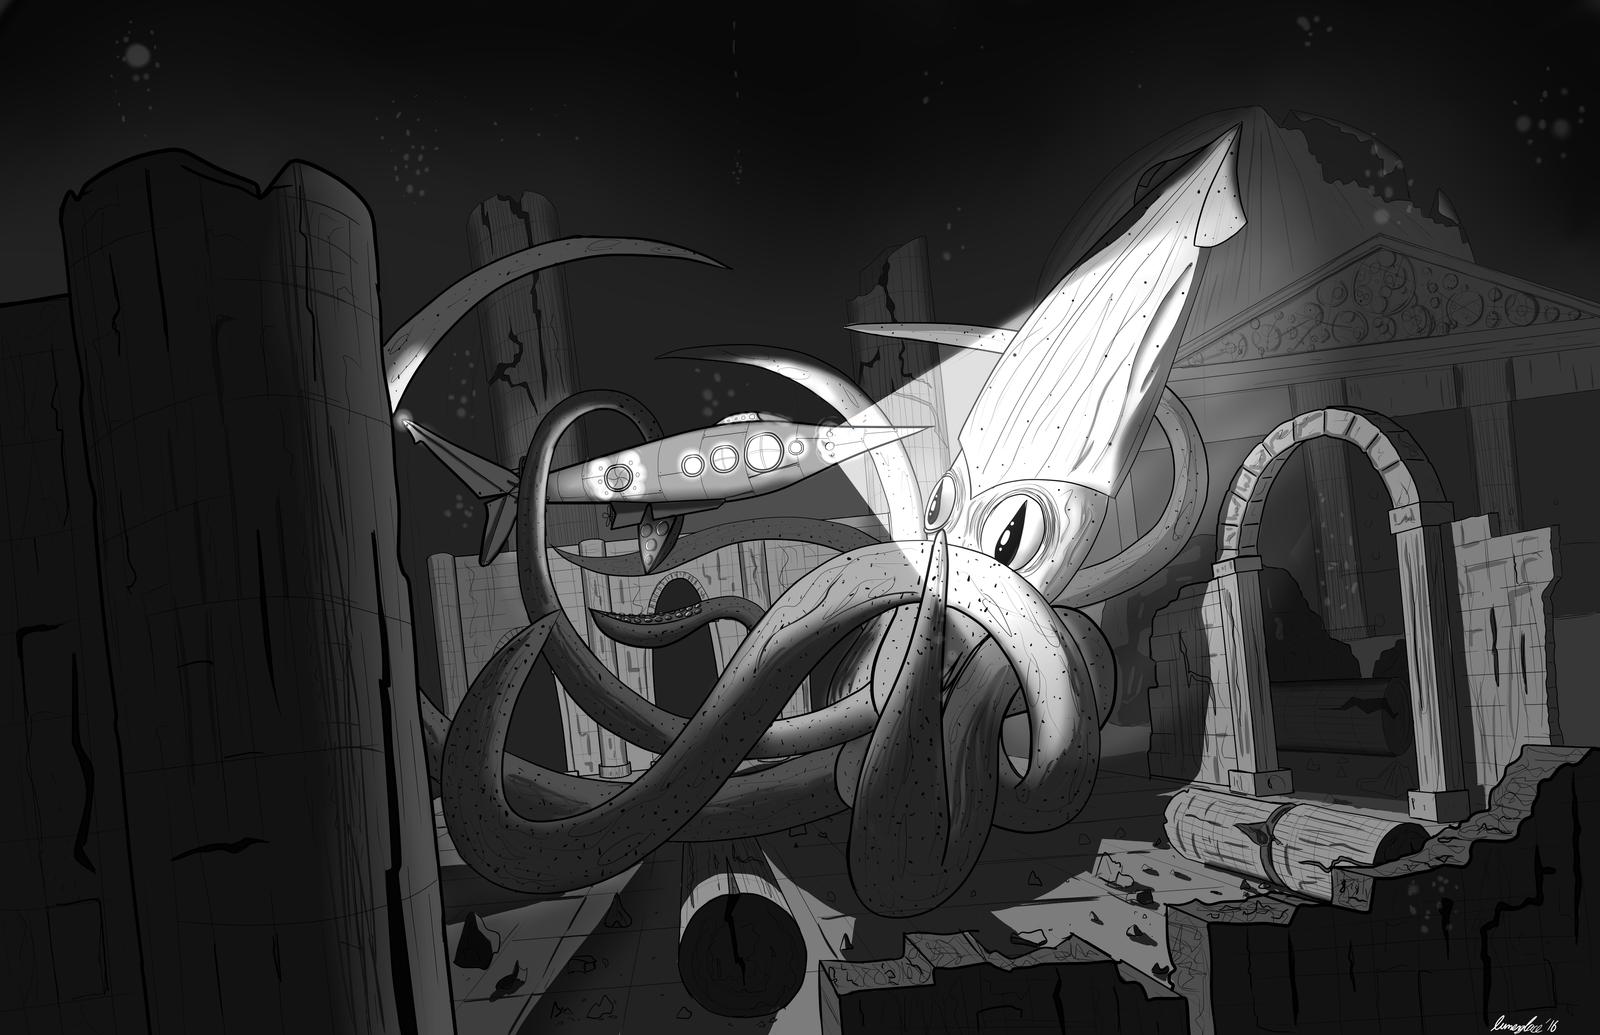 Nautilus by velocimaidfoxicorn